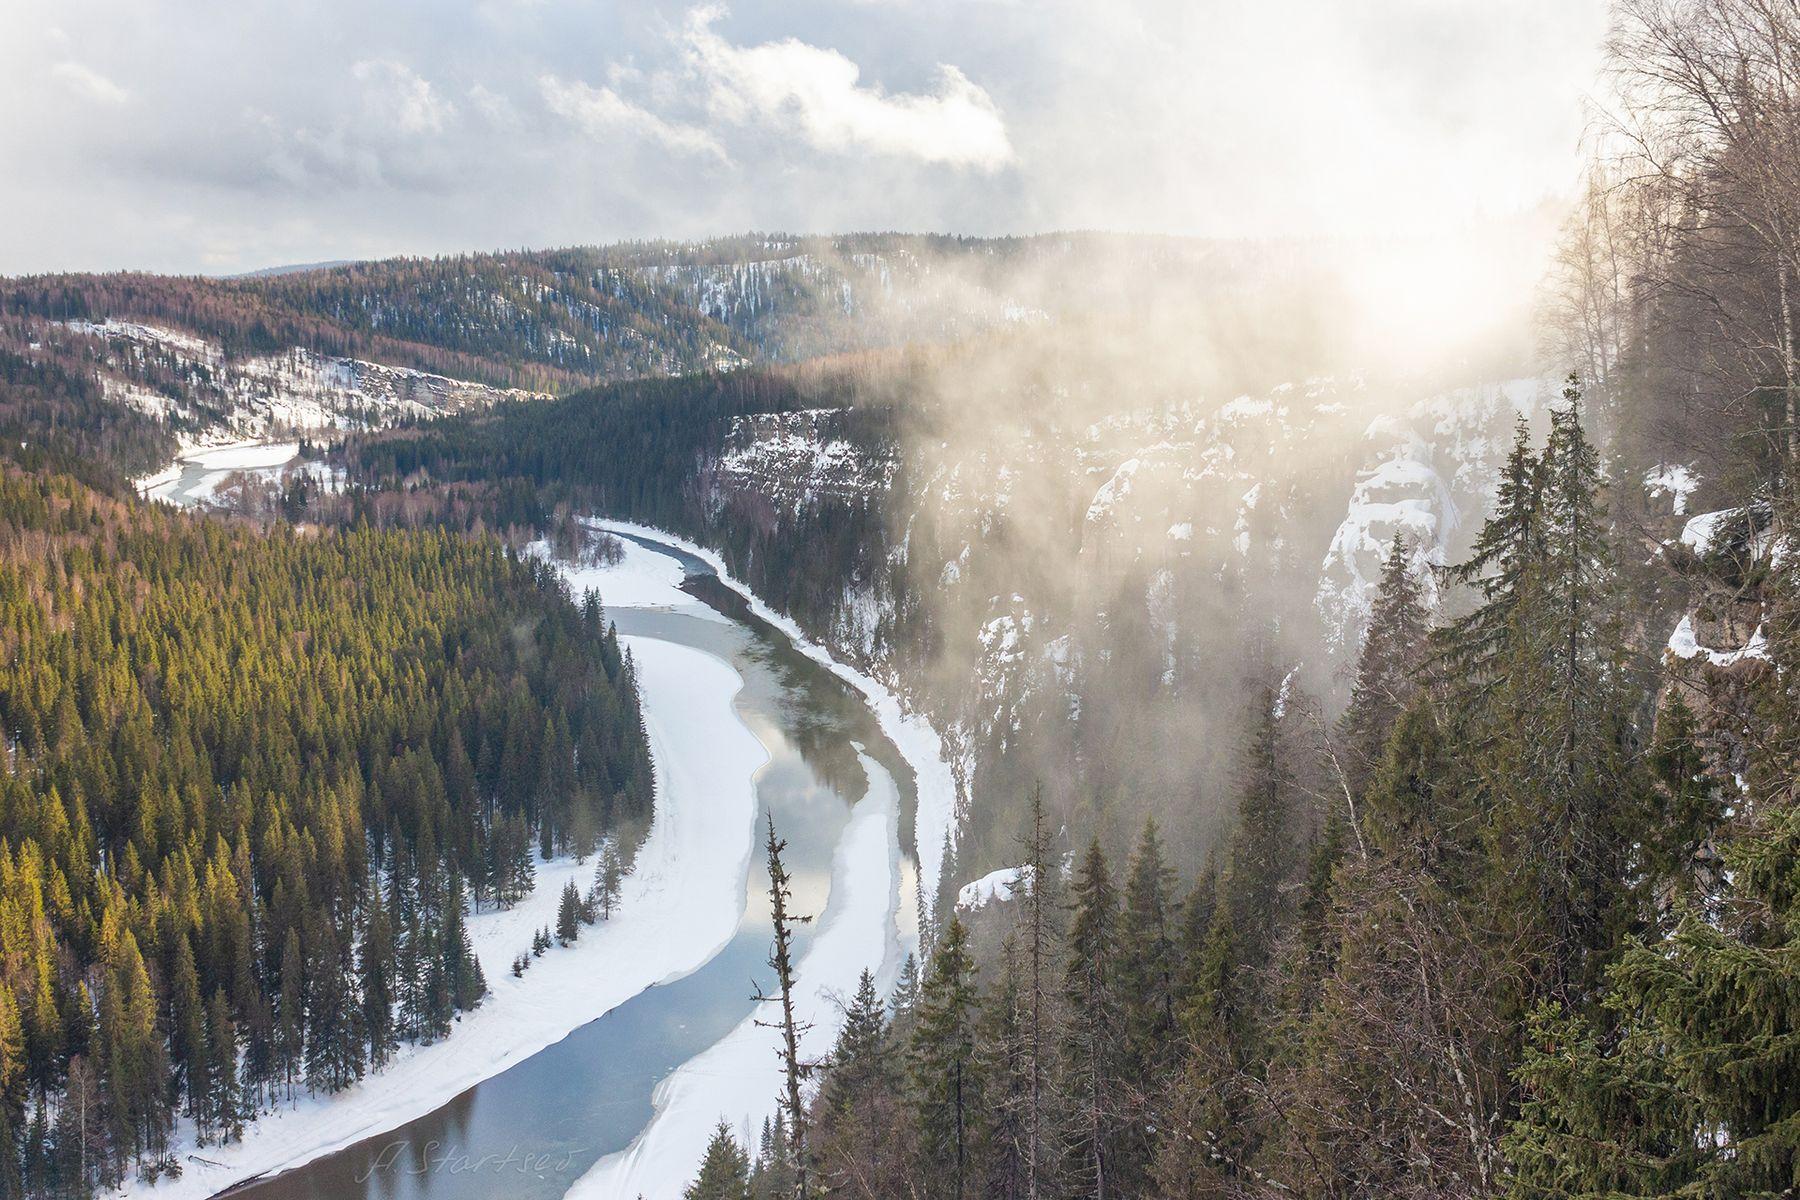 Туман над Усьвой зима снег река Усьва скала пейзаж природа Урал лес панорама туризм Пермский_край туман